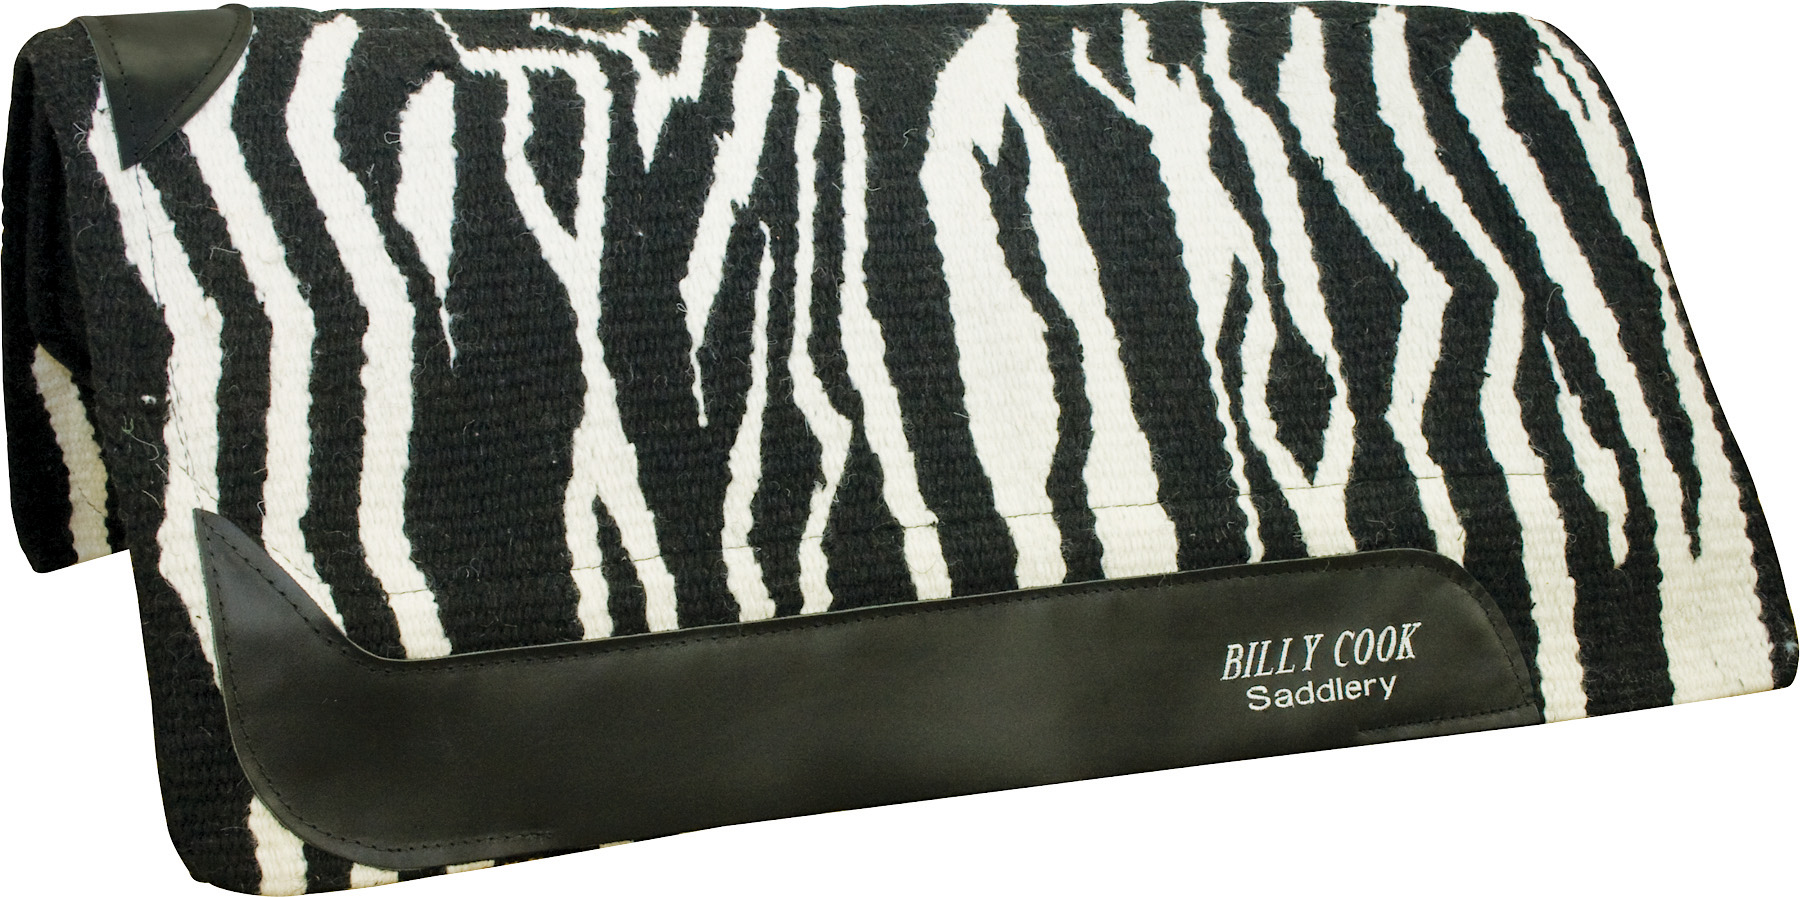 Billy Cook Saddlery Zebra VIP Pad